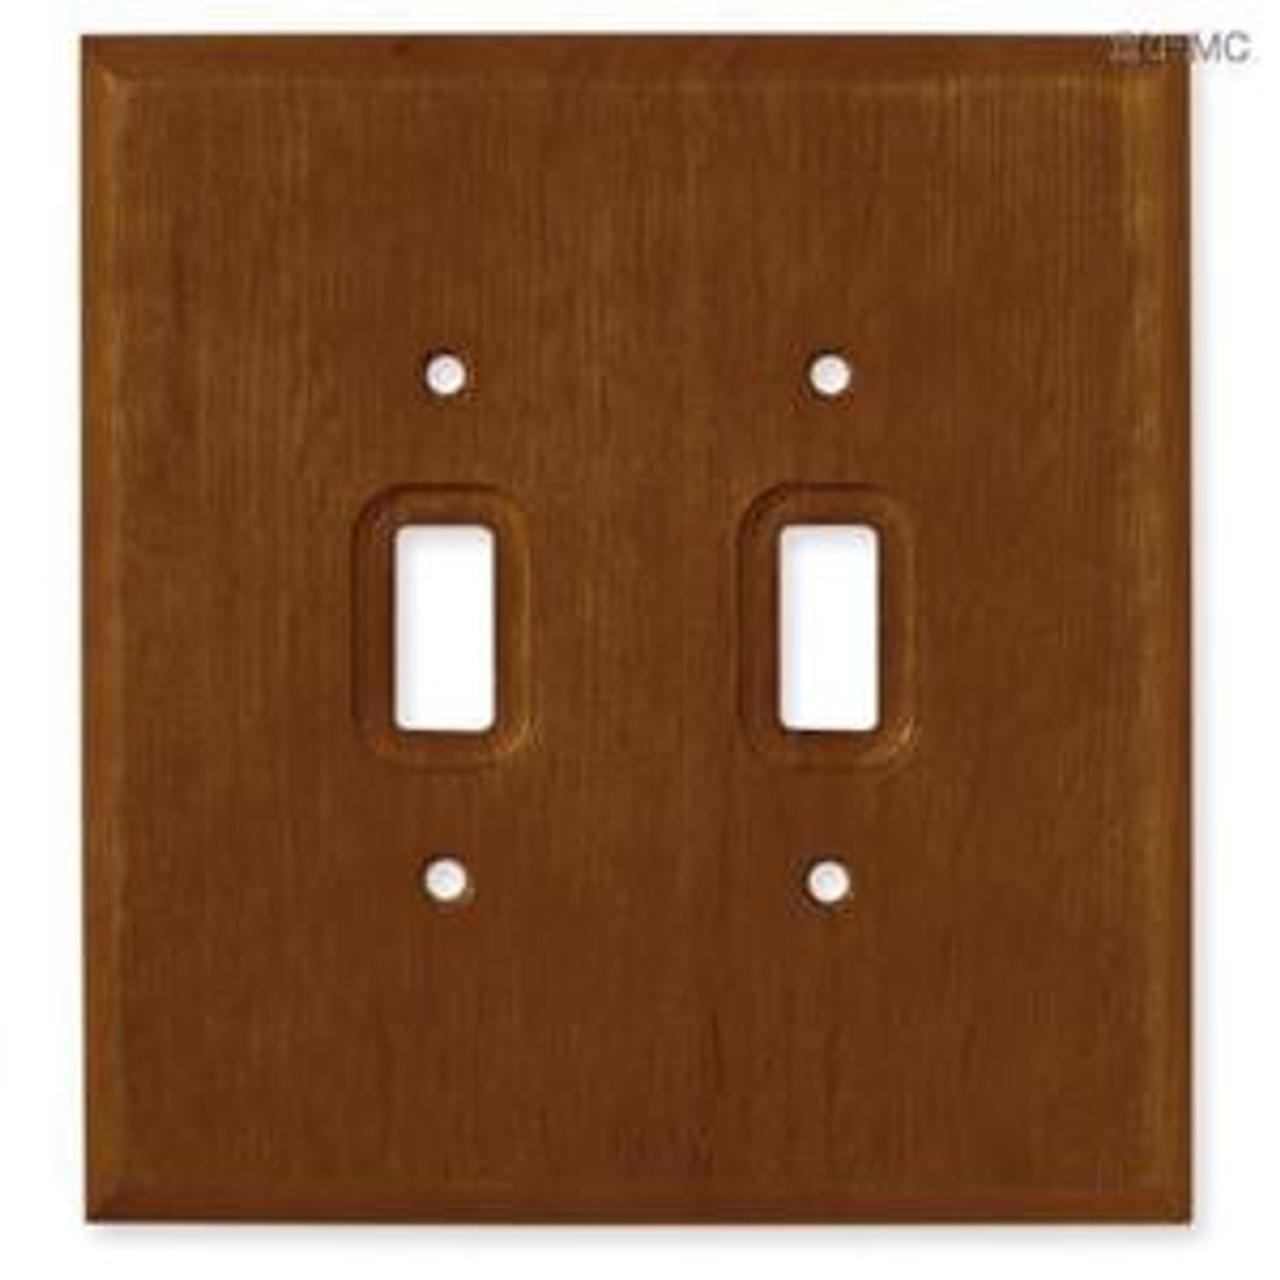 126427 Dark Oak Wood Double Switch Plate Cover